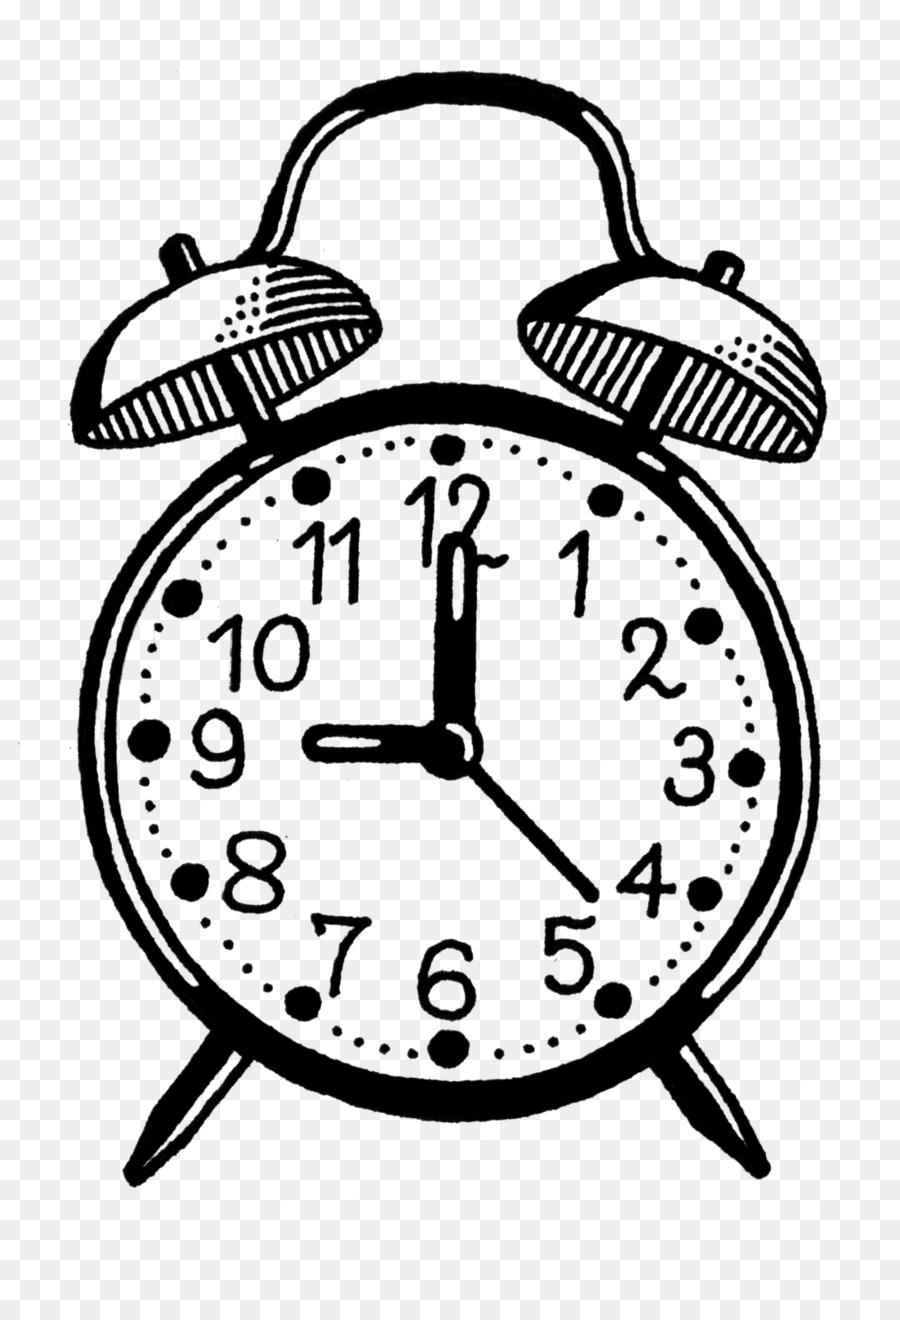 vector black and white library Clocks clipart dog. Cartoon clock font transparent.